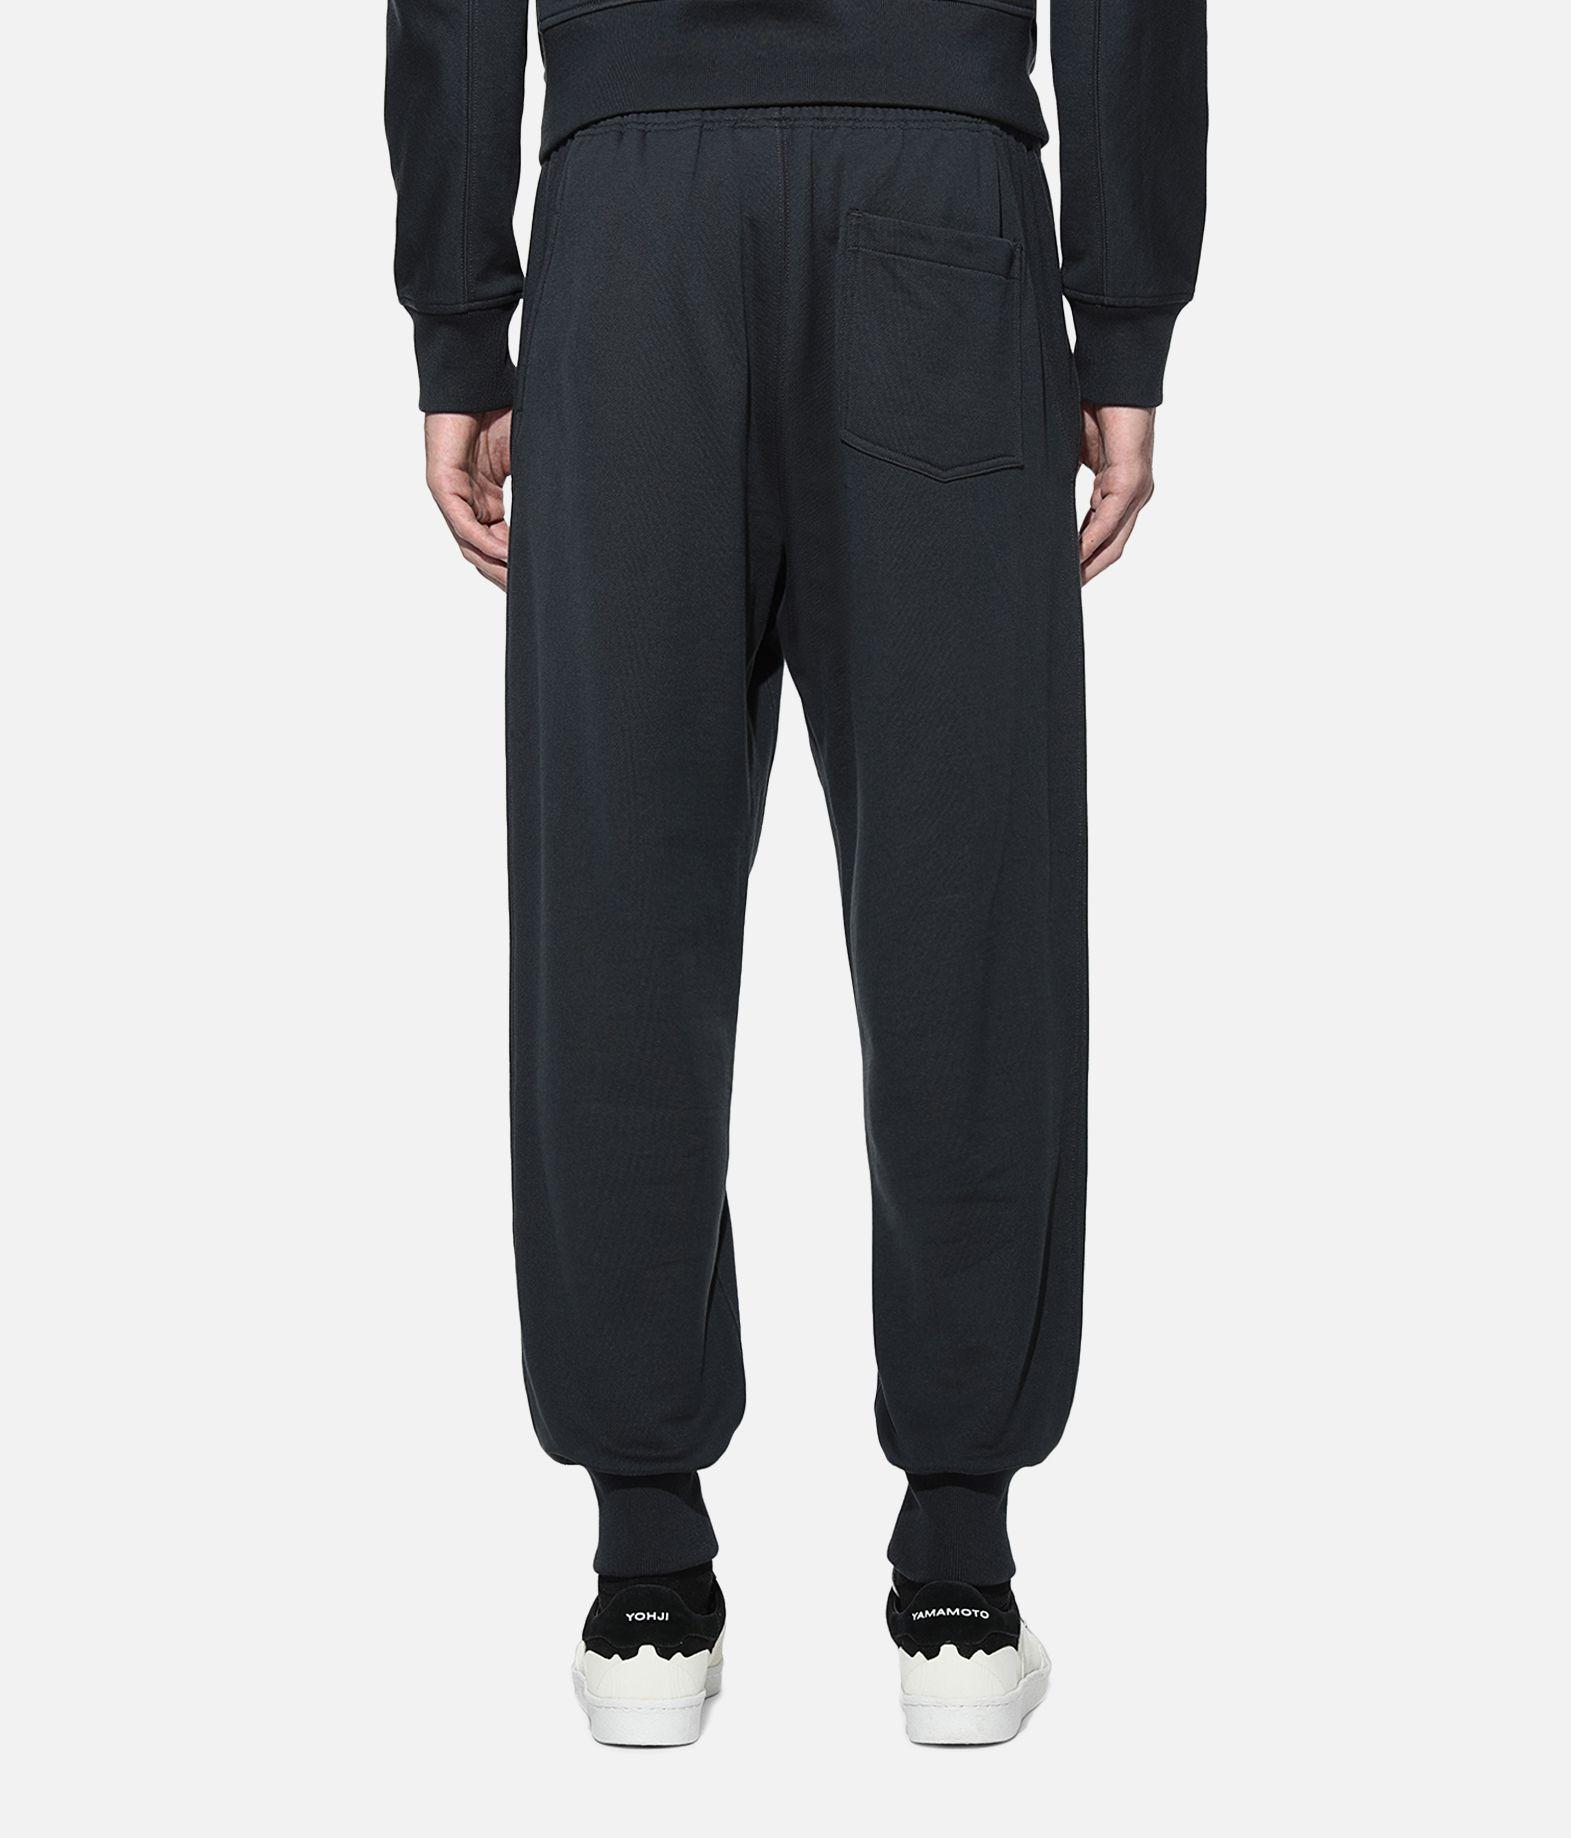 Y-3 Y-3 Classic Cuffed Pants Спортивные брюки Для Мужчин d